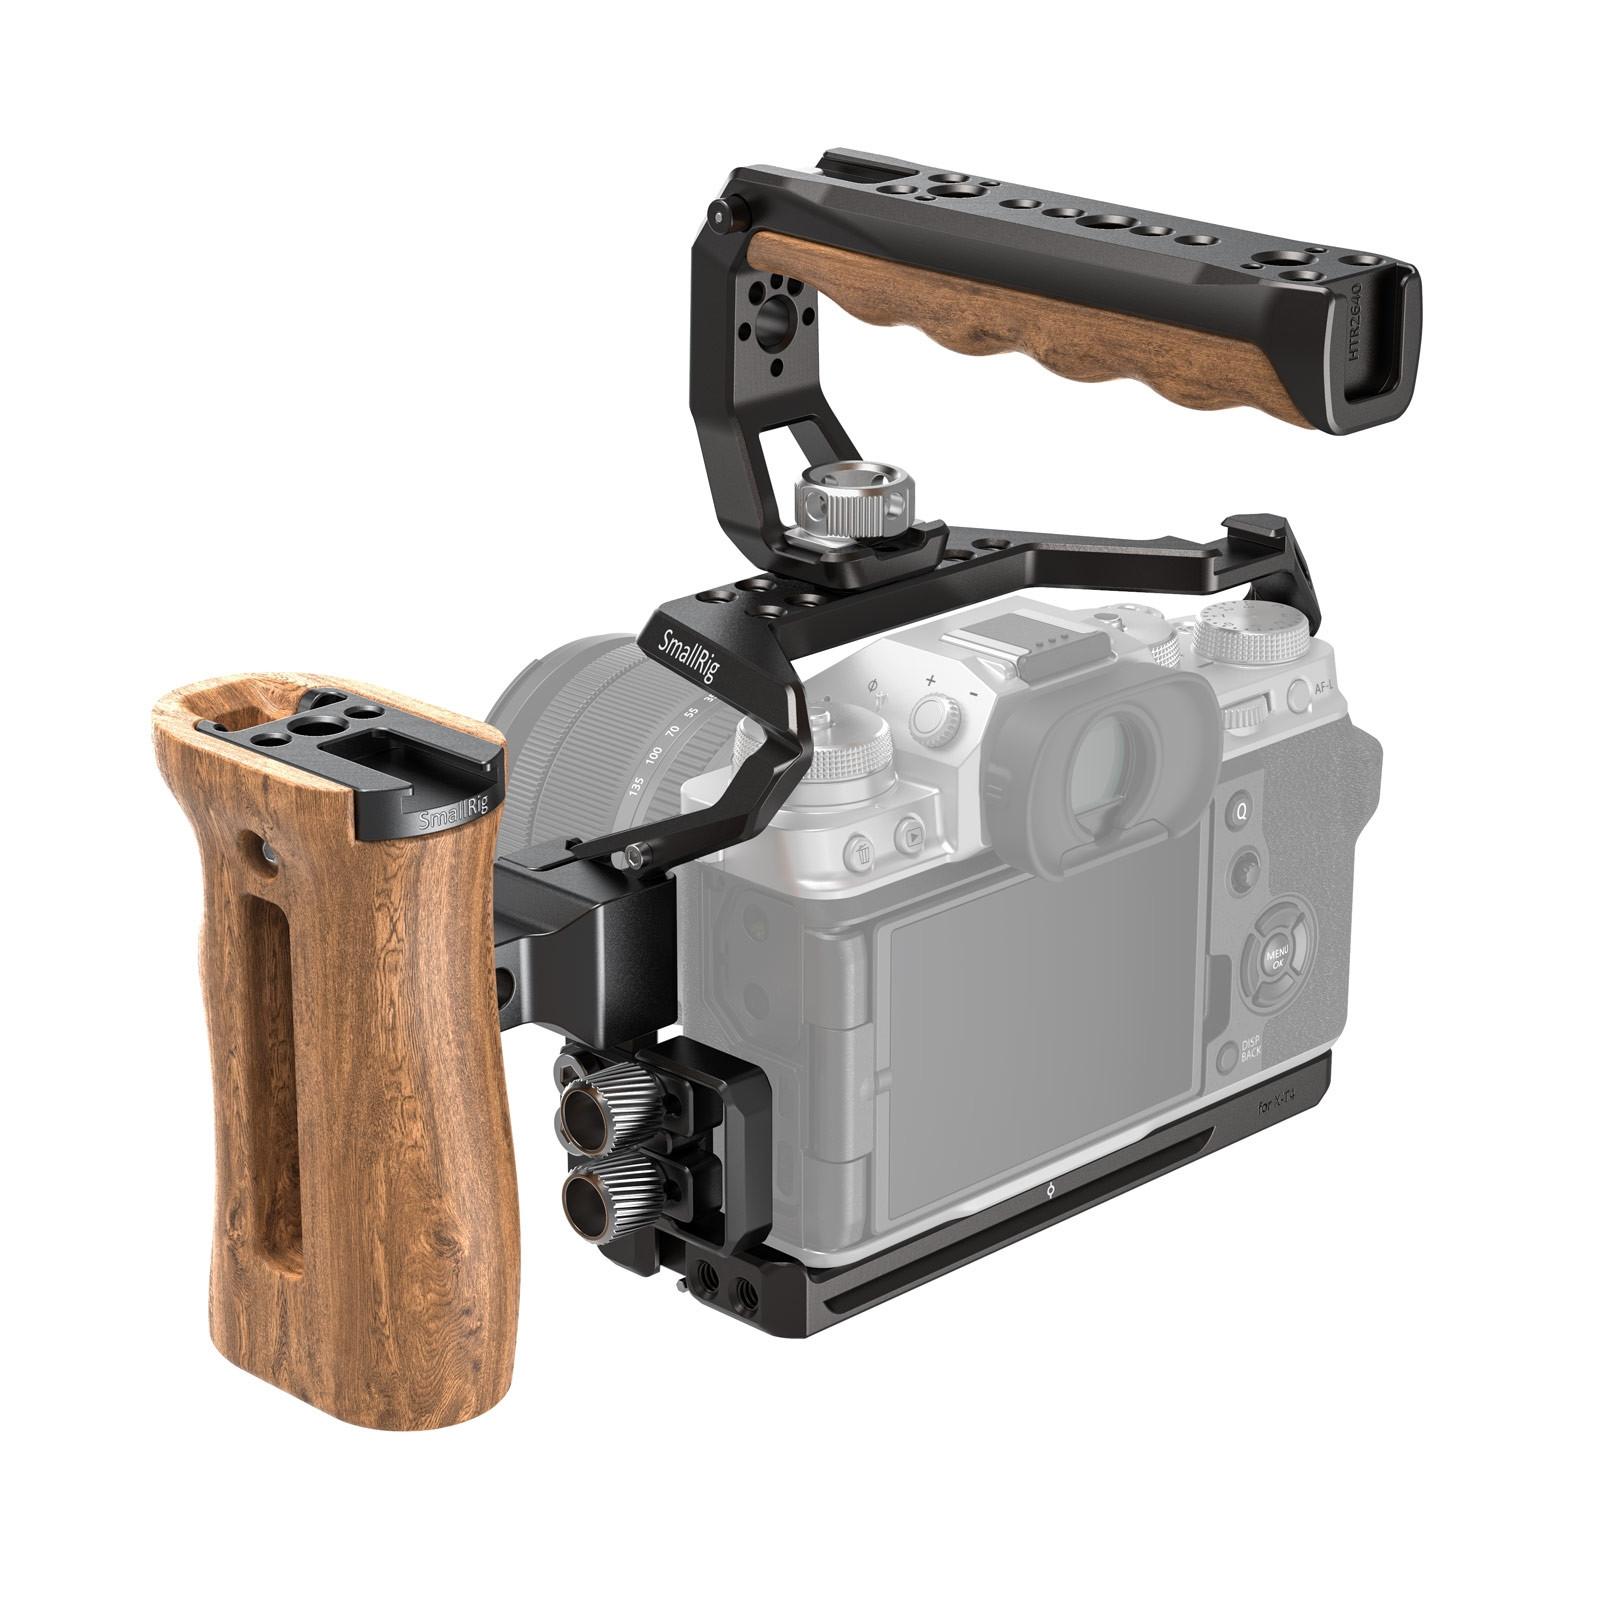 SmallRig Professional Camara Cage Kit for FUJIFILM X-T4 3131B